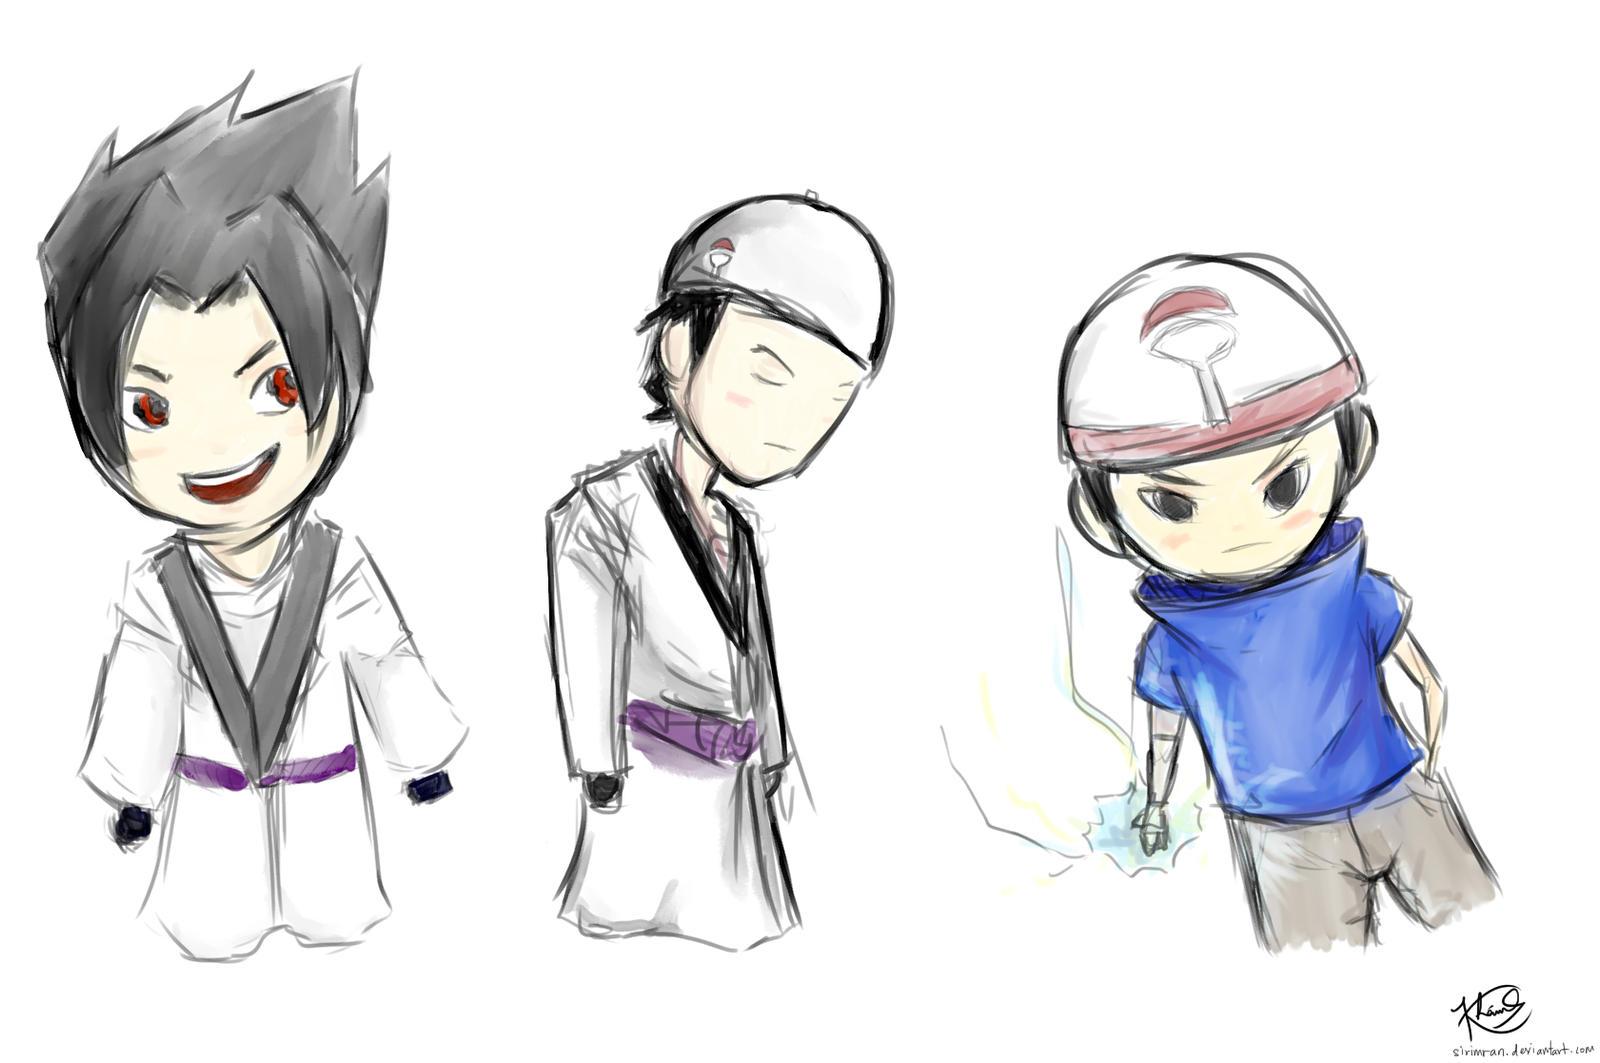 Gambar Anime Naruto Islam Sasuke Muslim Chibi Sketch By Sirimran On Deviantart